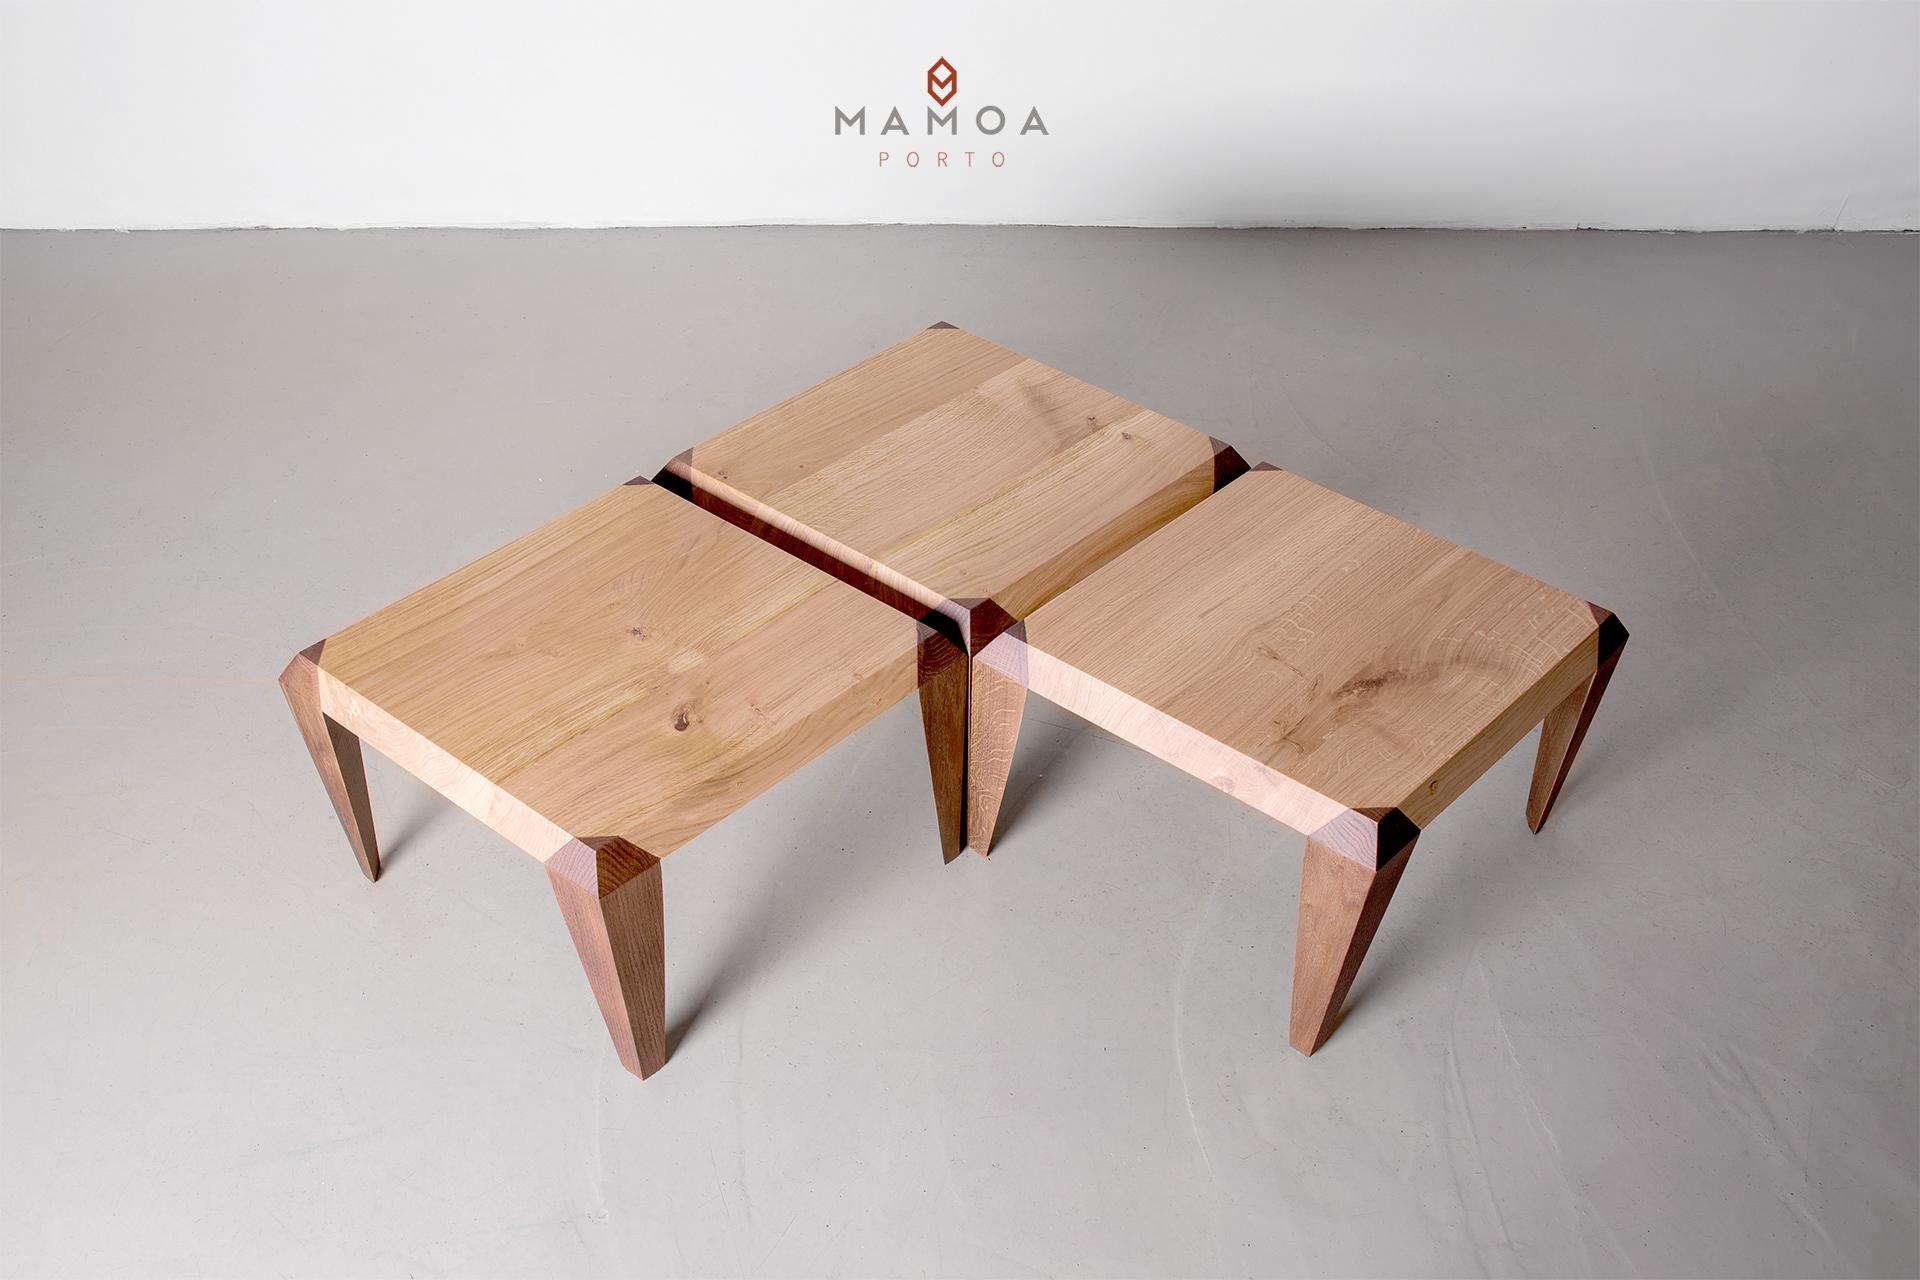 inês osório - TURN :: modular coffee table